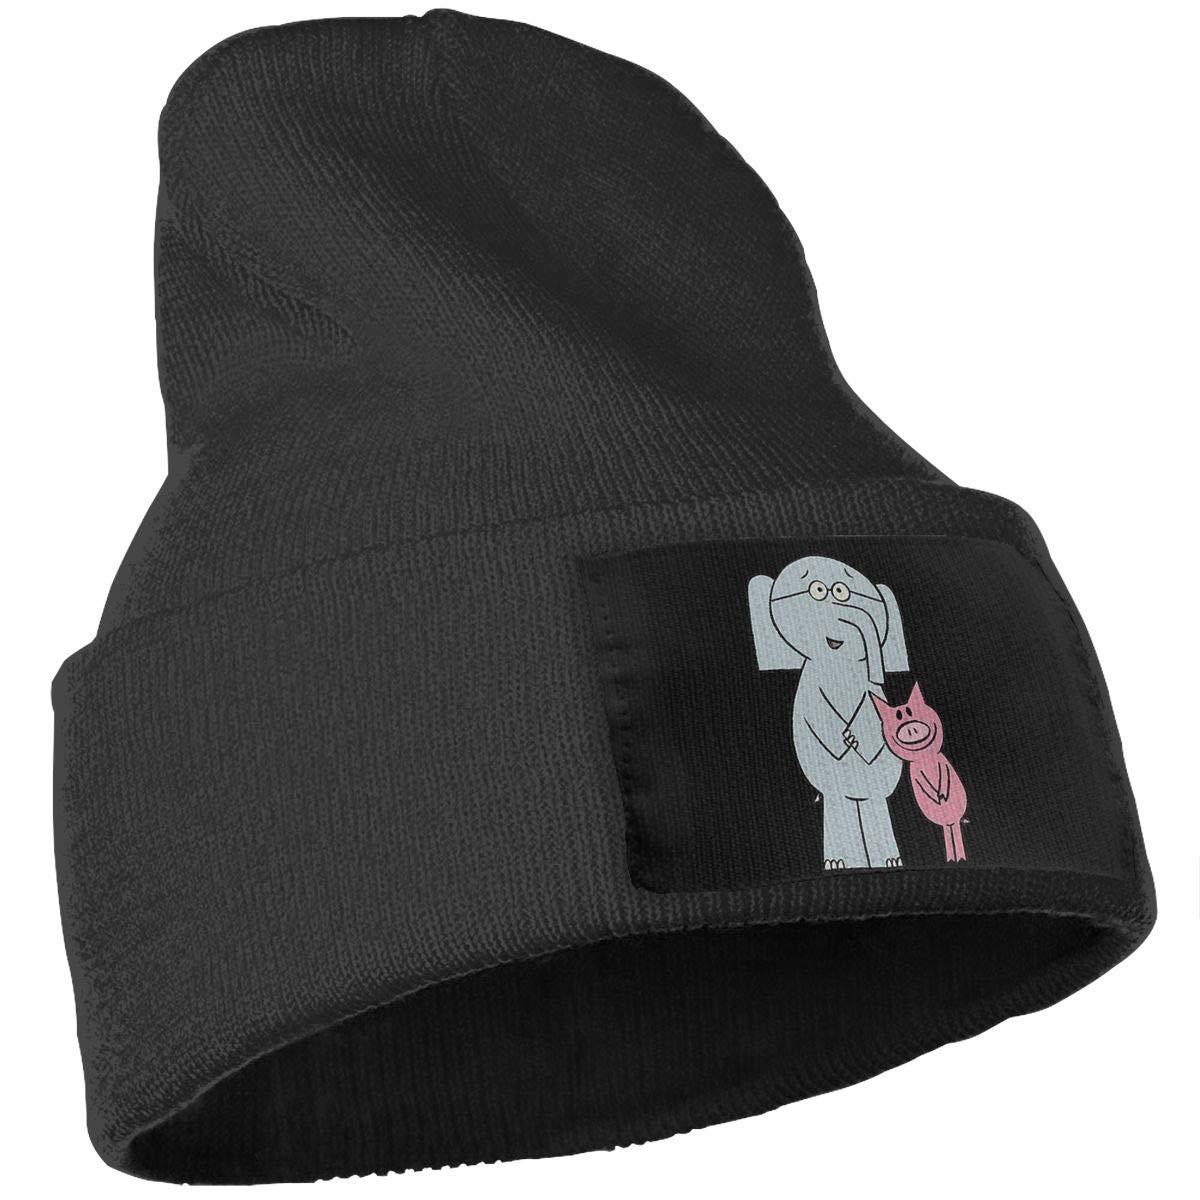 SLADDD1 Elephant and Piggie Warm Winter Hat Knit Beanie Skull Cap Cuff Beanie Hat Winter Hats for Men /& Women